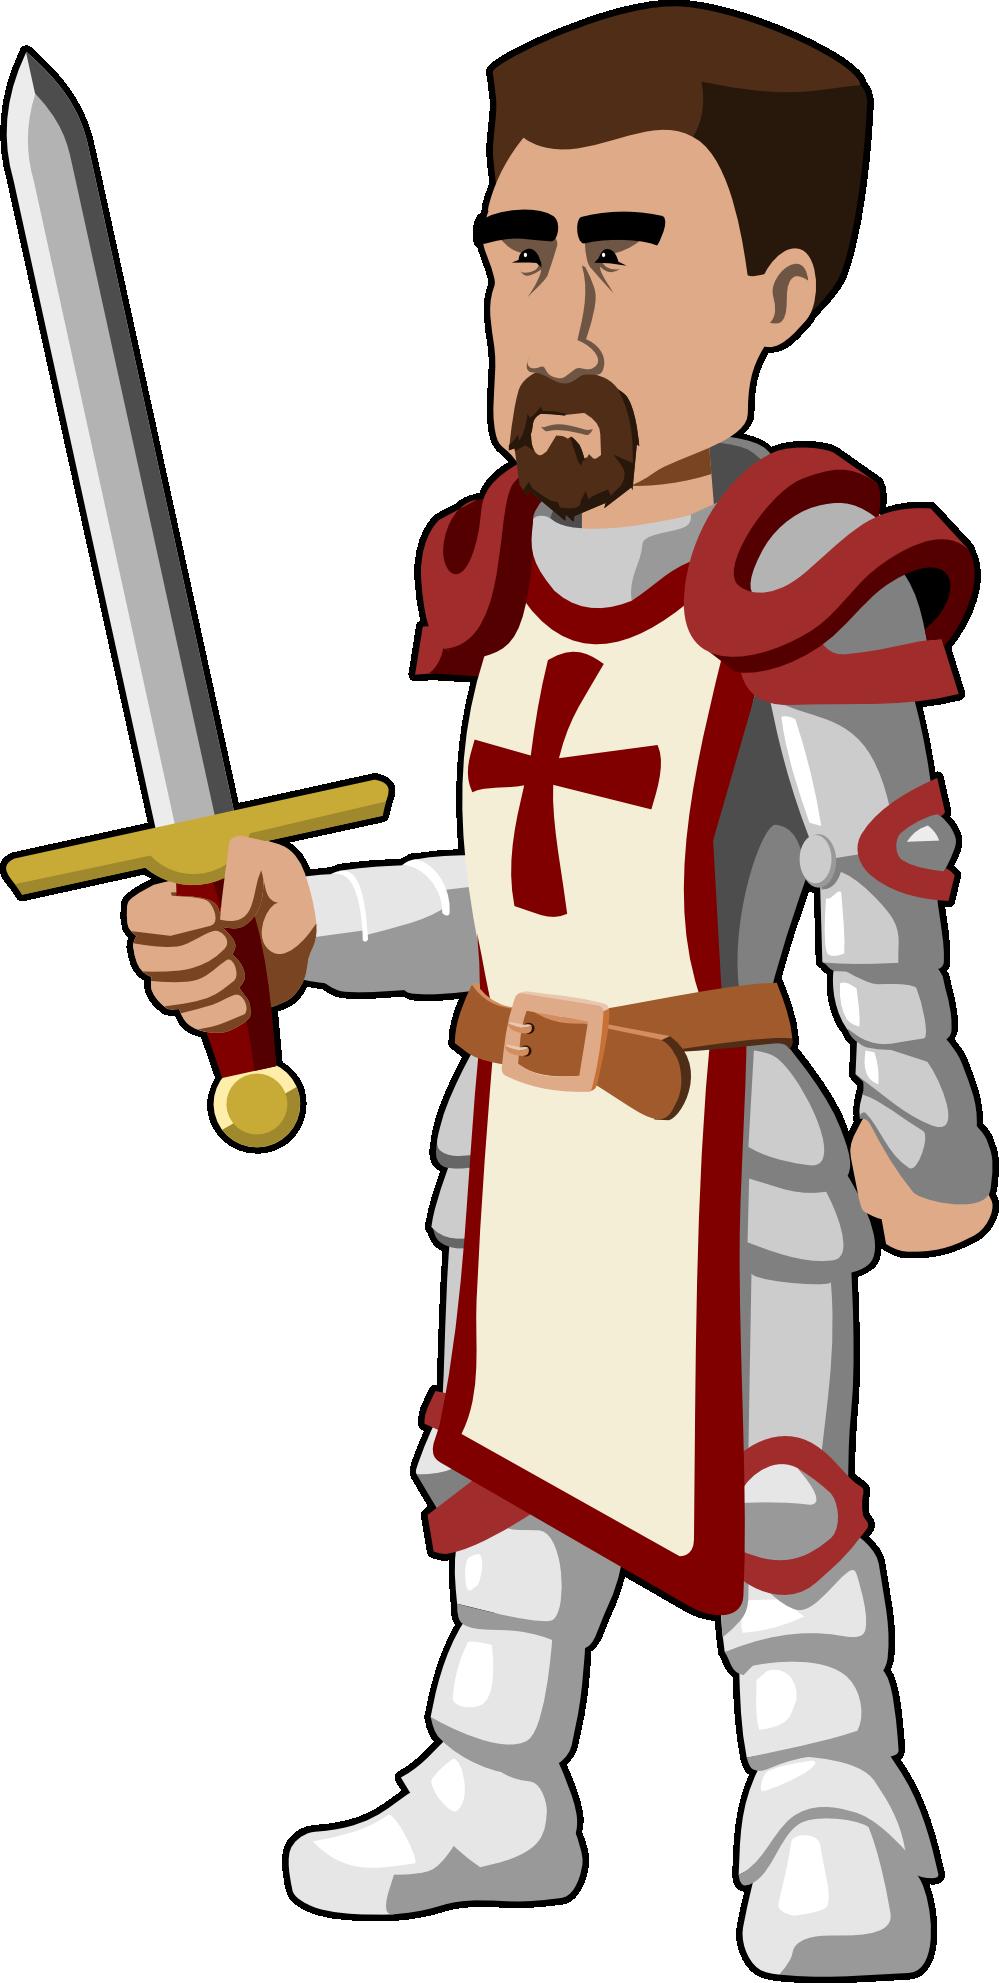 Knight clipart castle guard, Knight castle guard Transparent.